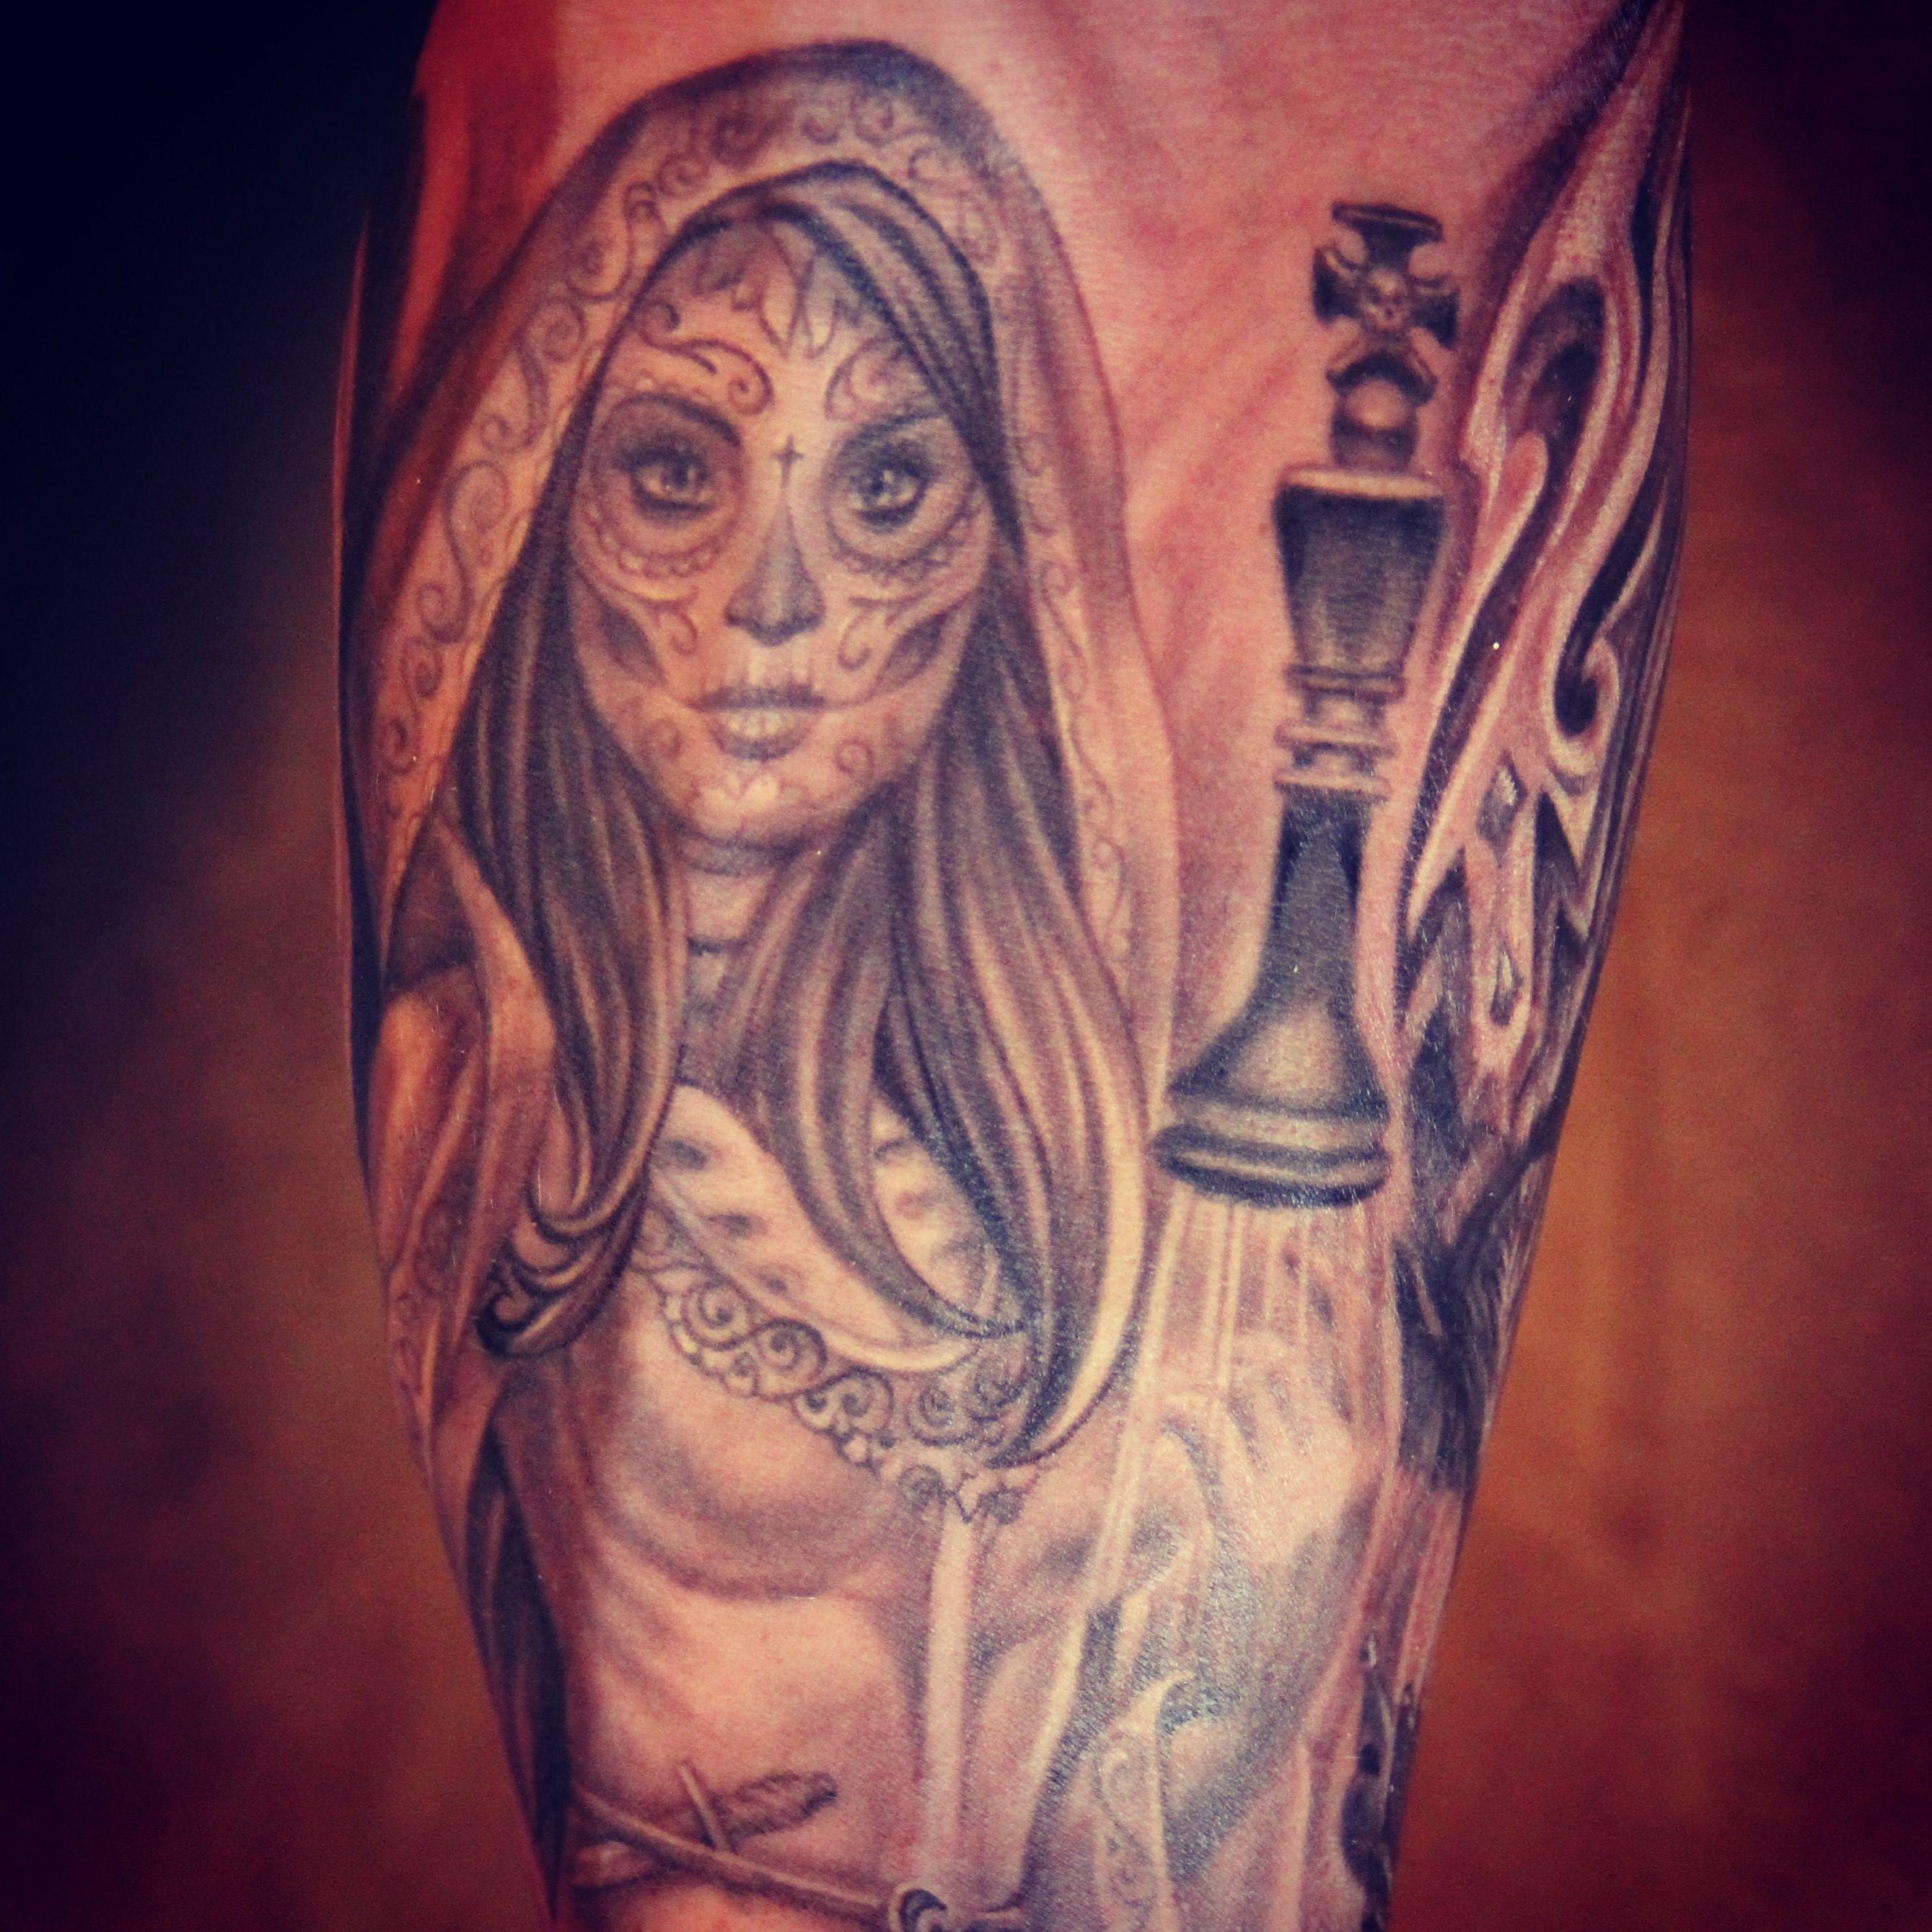 Tattoo by artist latisha wood orange county california for Tattoo artists orange county